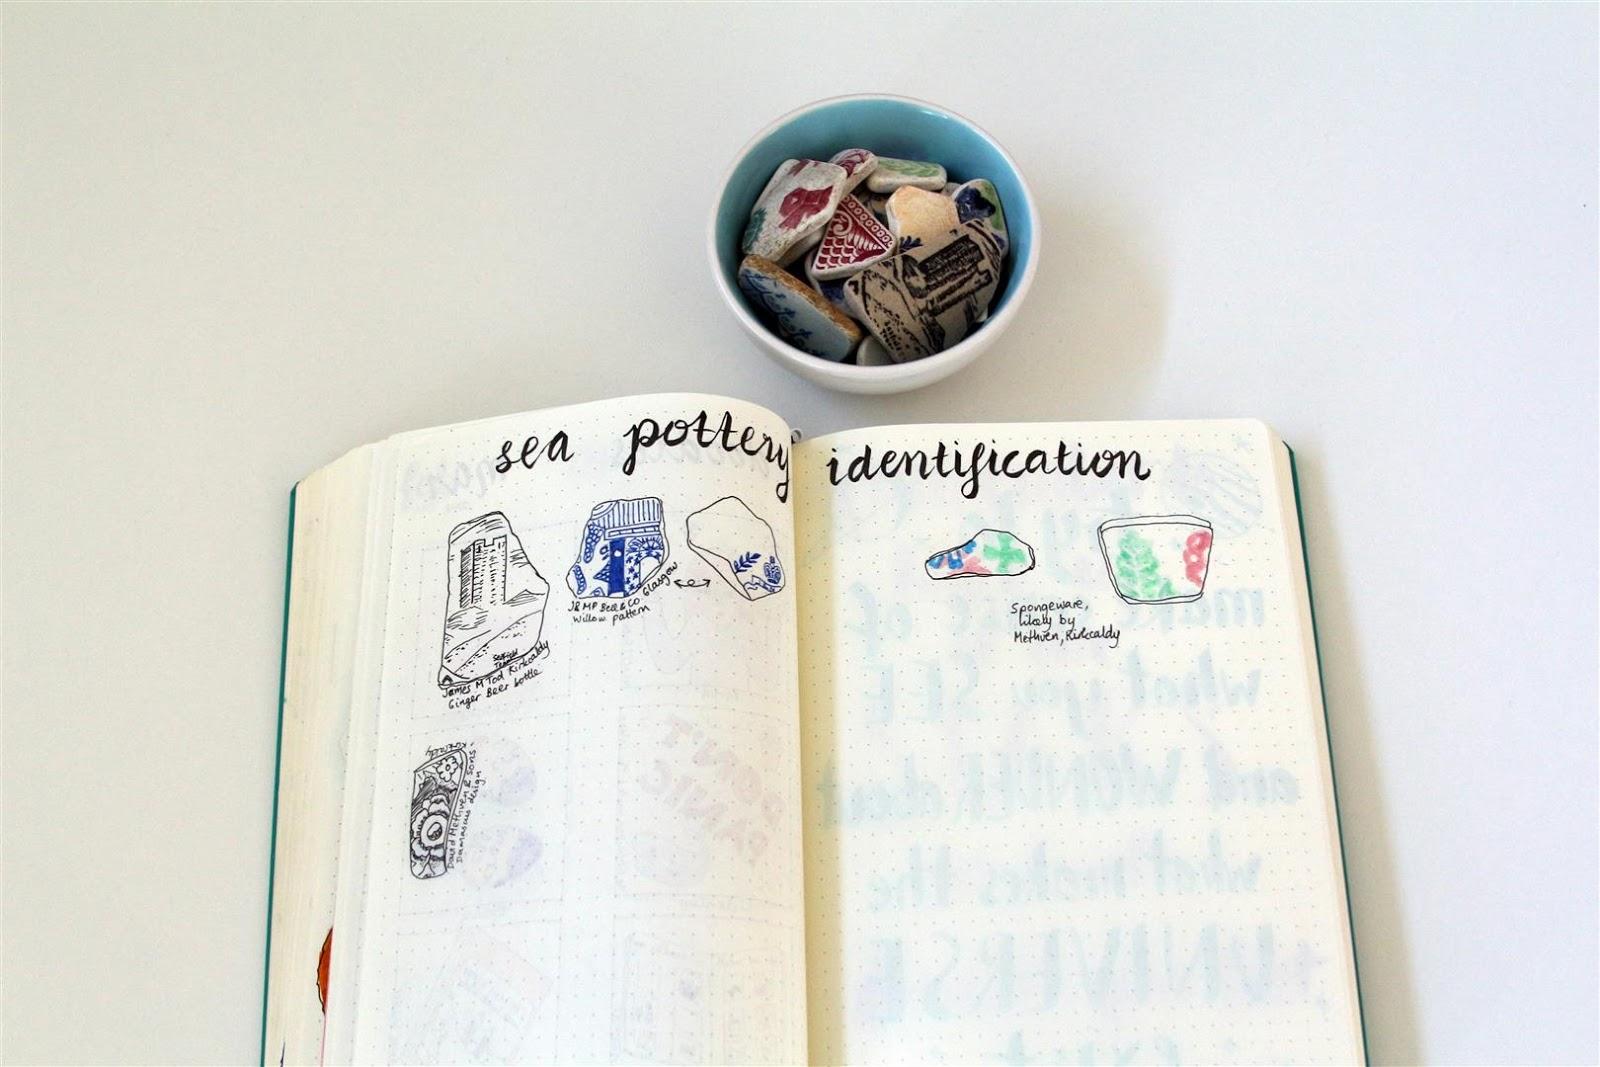 emuse: Sea pottery identification